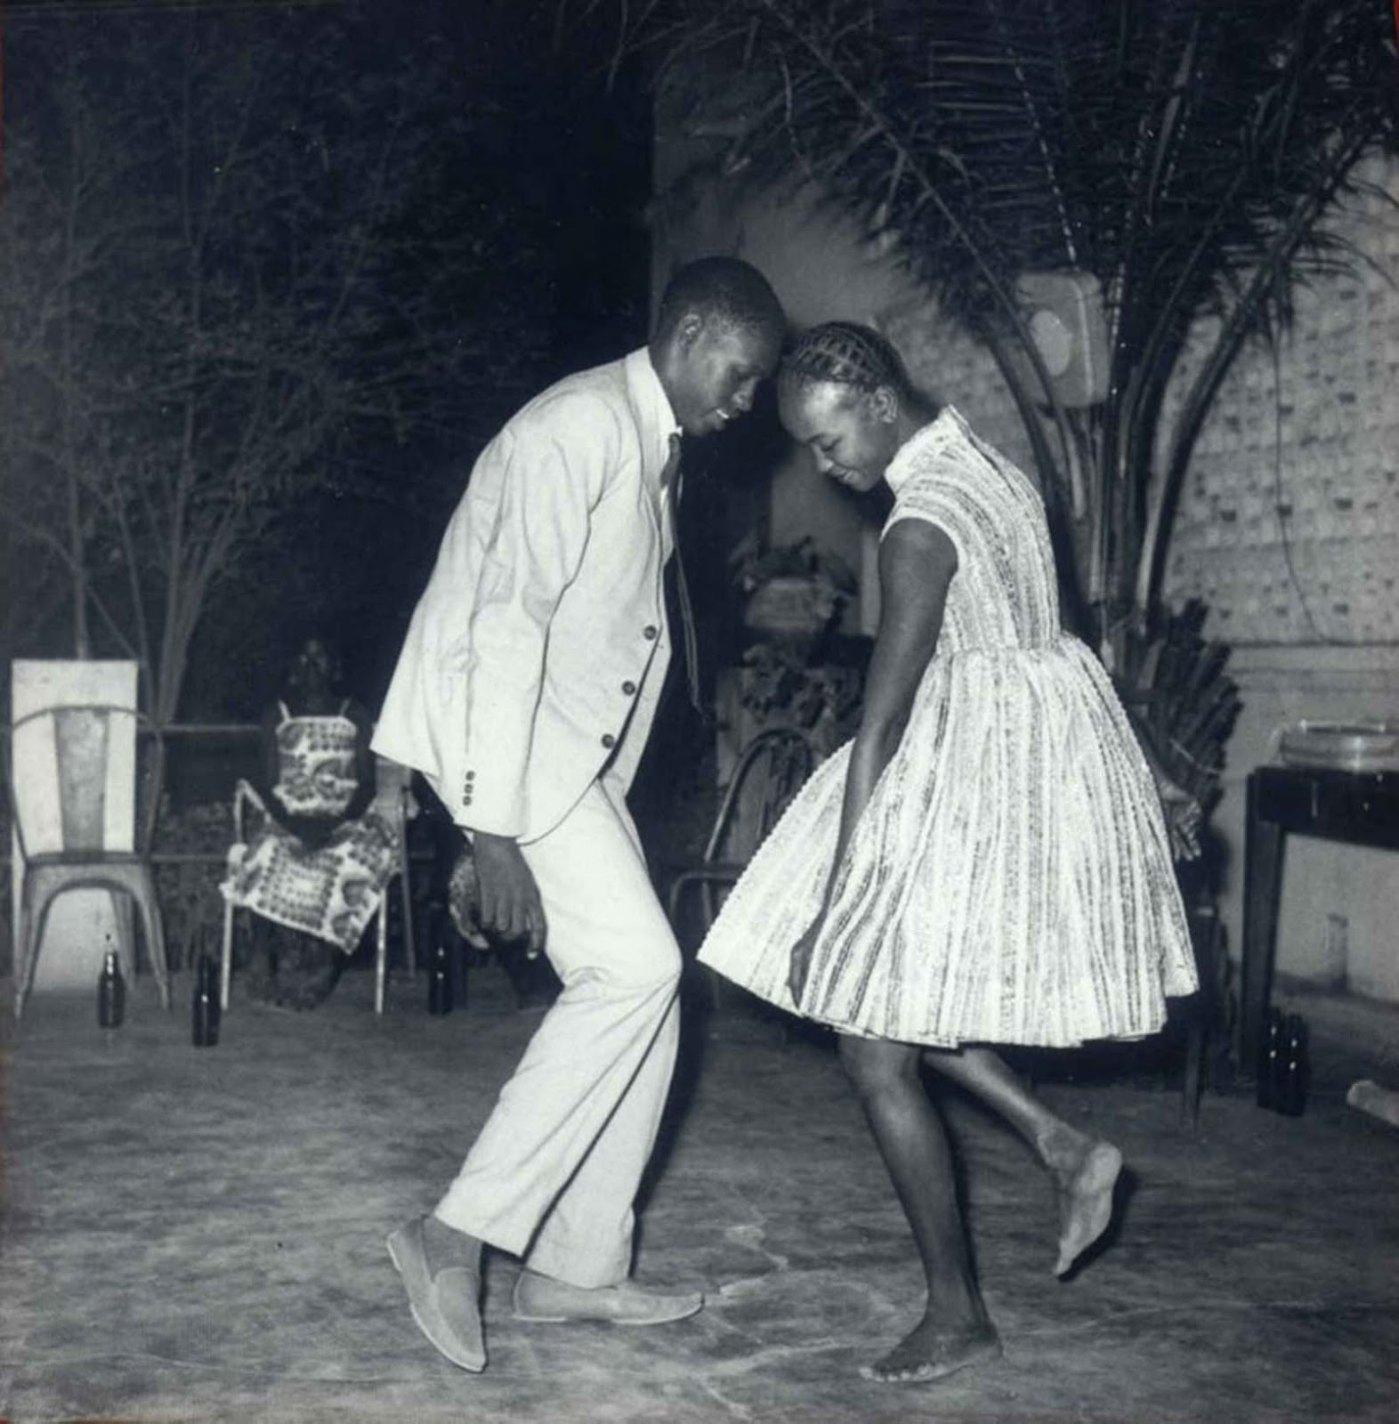 Nuit de Noël (Happy Club), Malick Sidibè, 1963